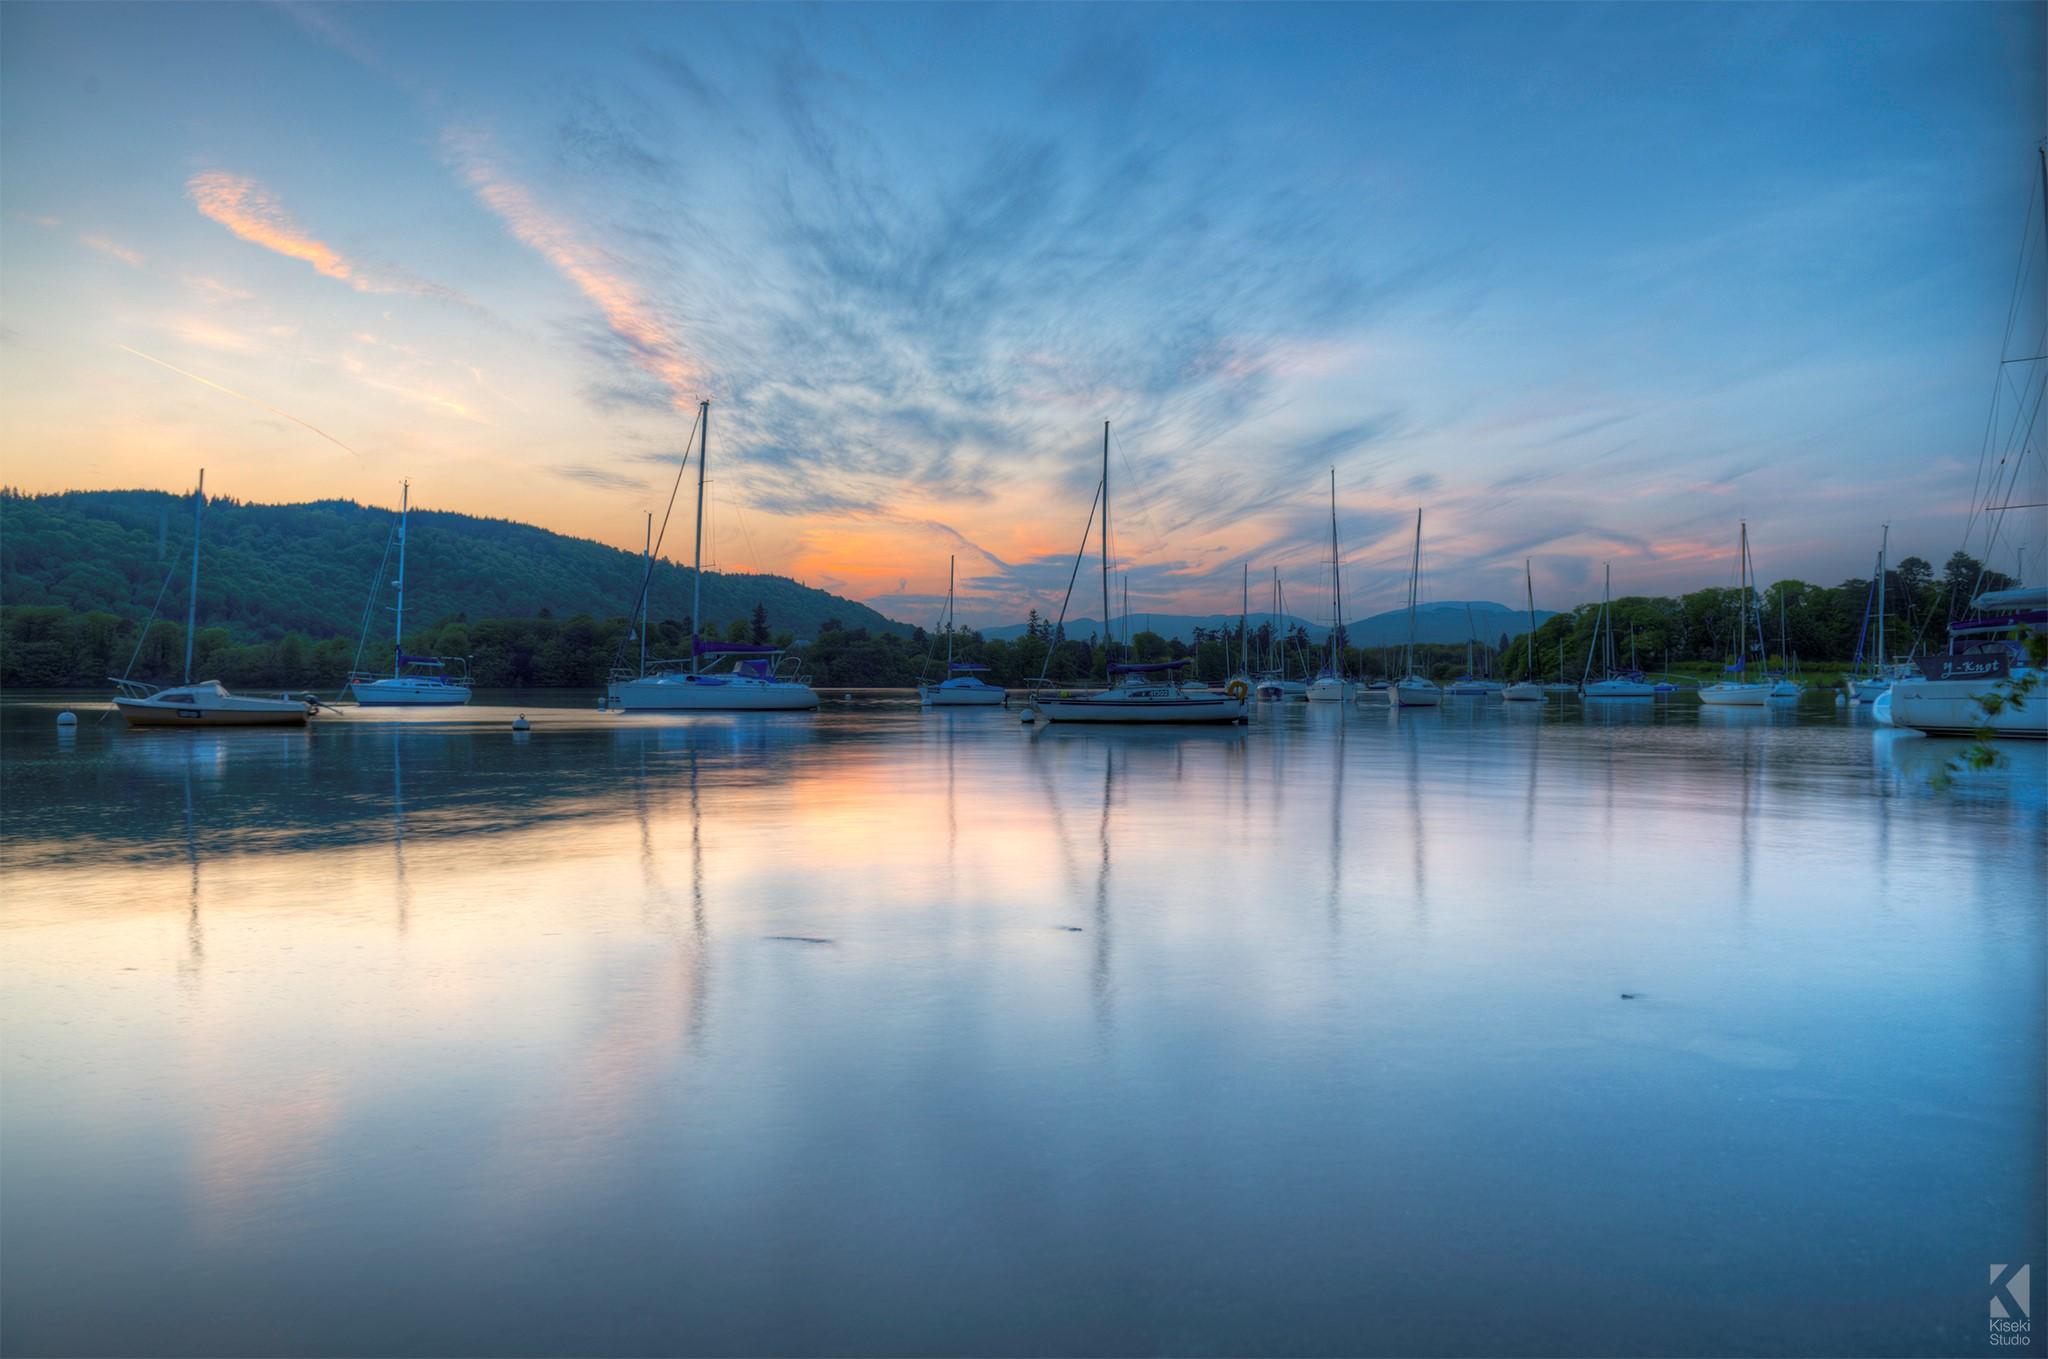 Sunset on Lake Windermere HDR